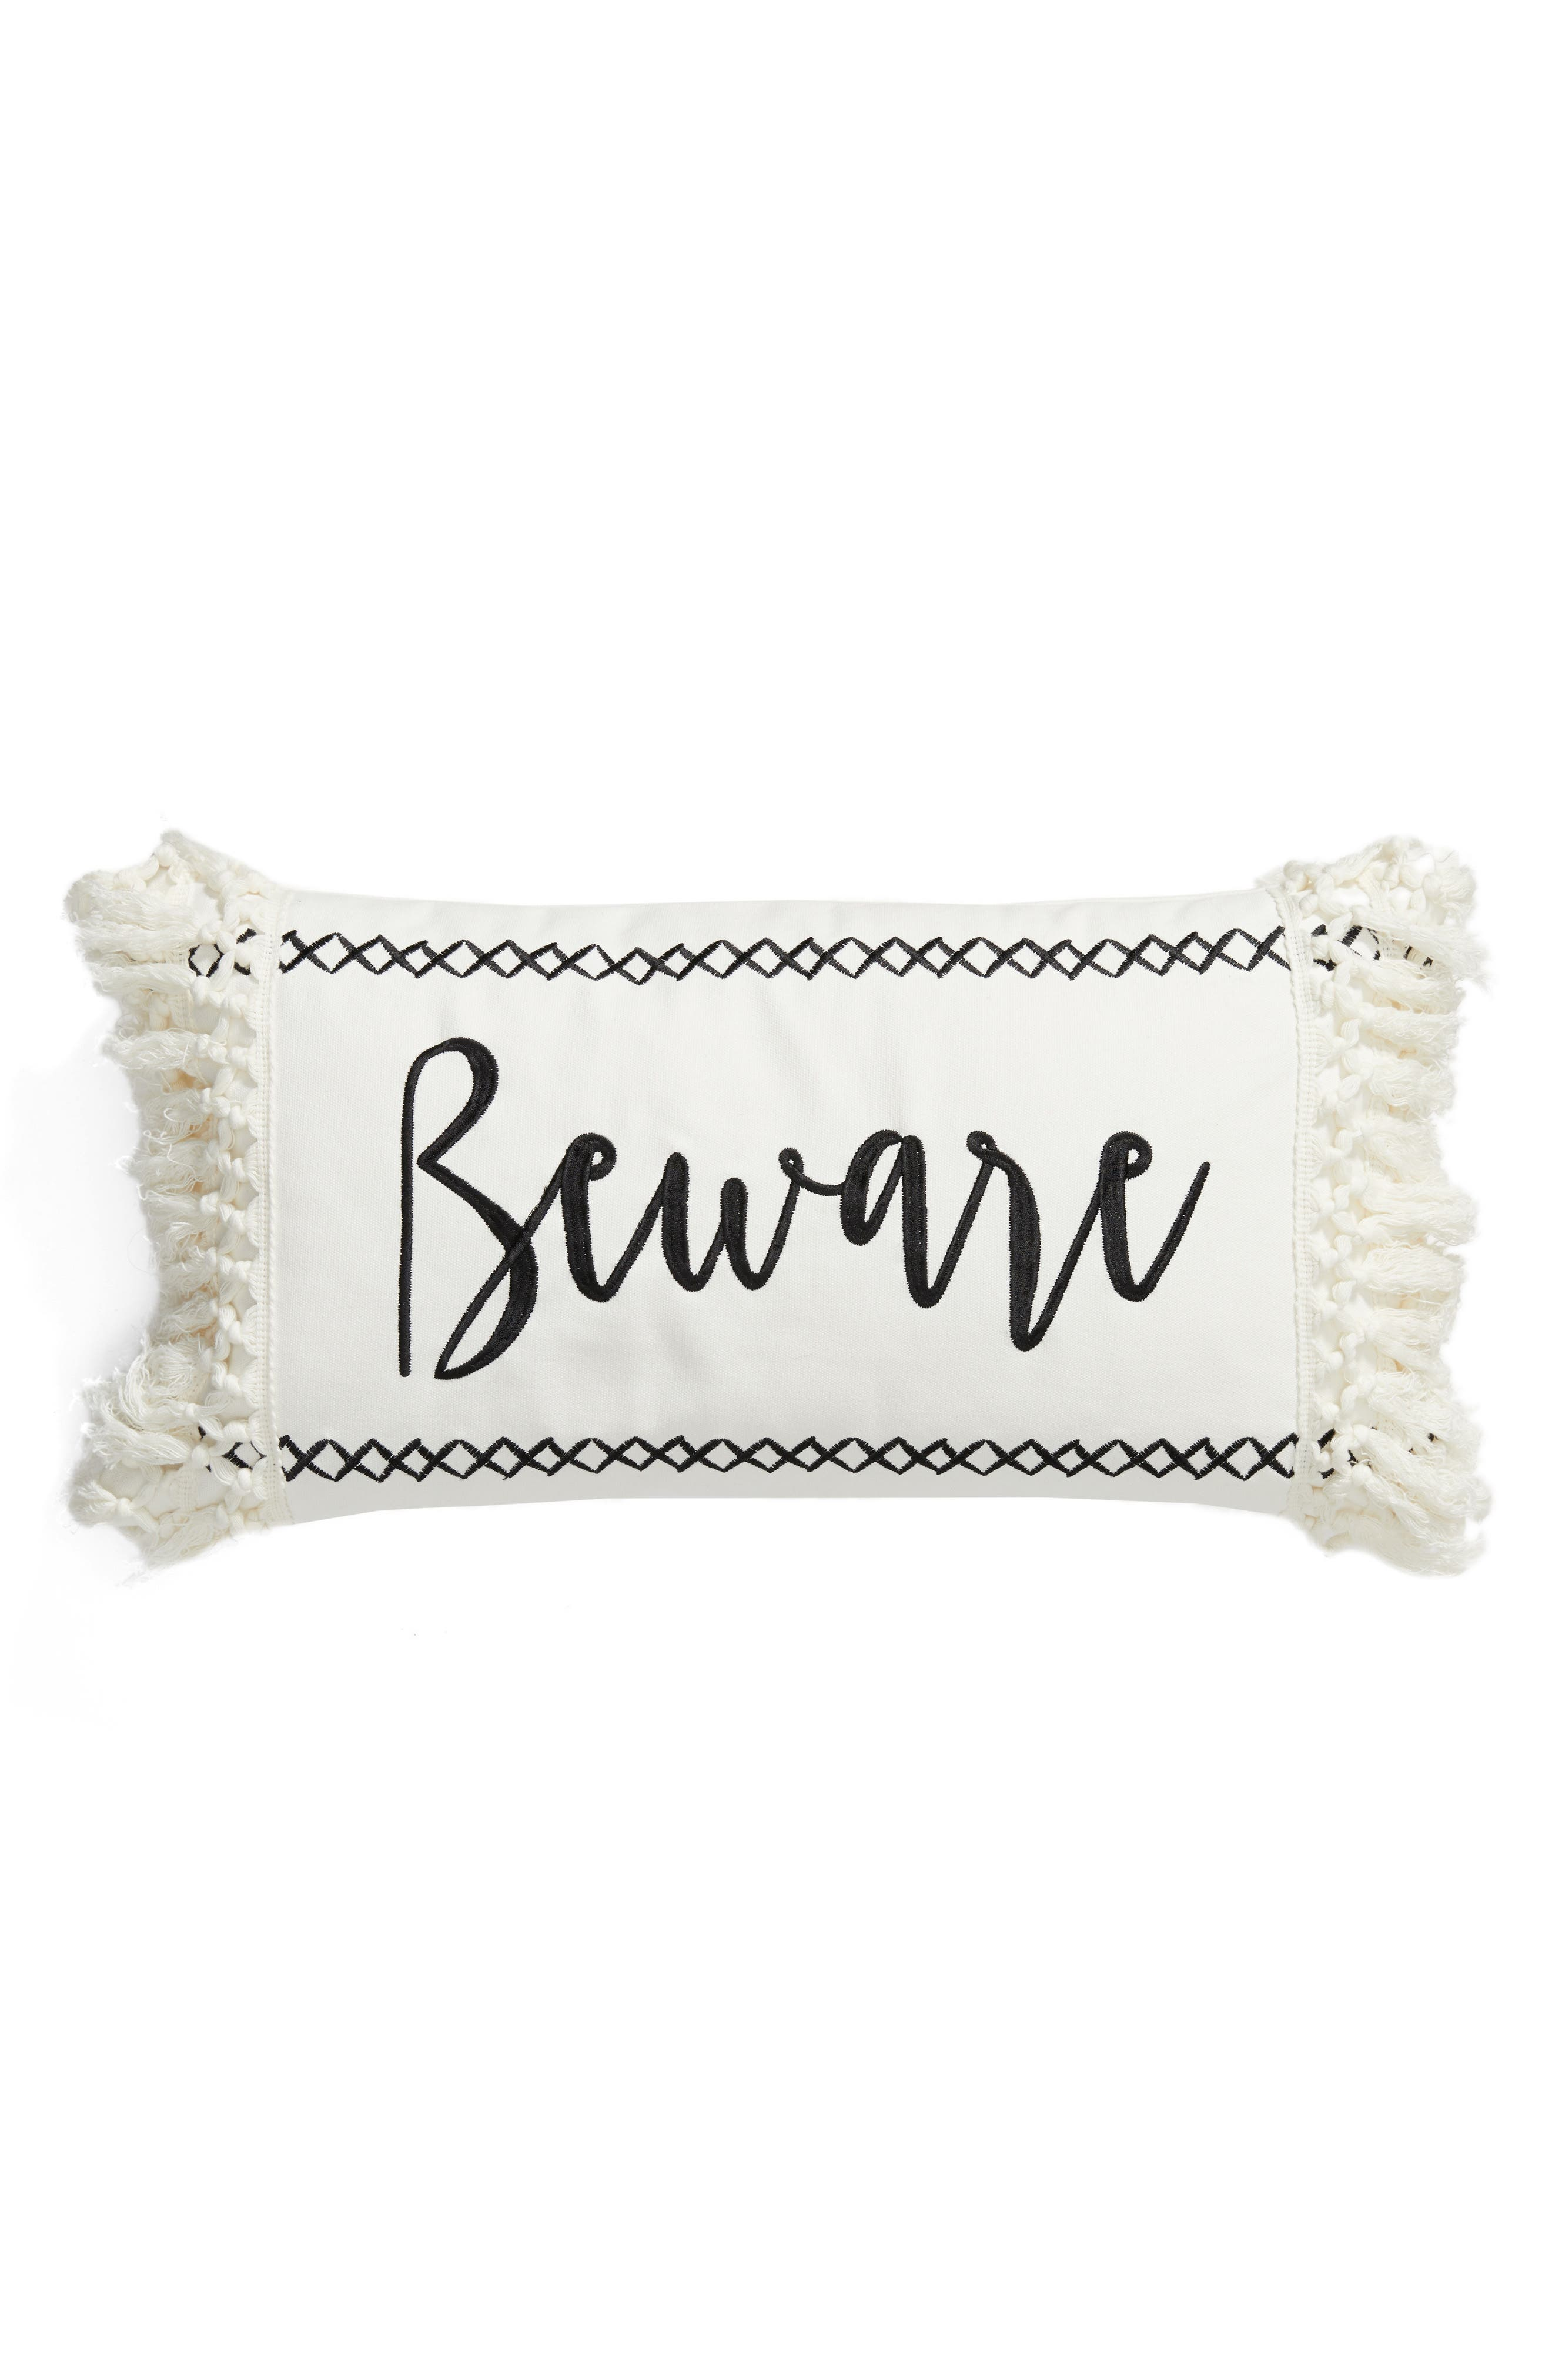 Main Image - Levtex Beware Accent Pillow